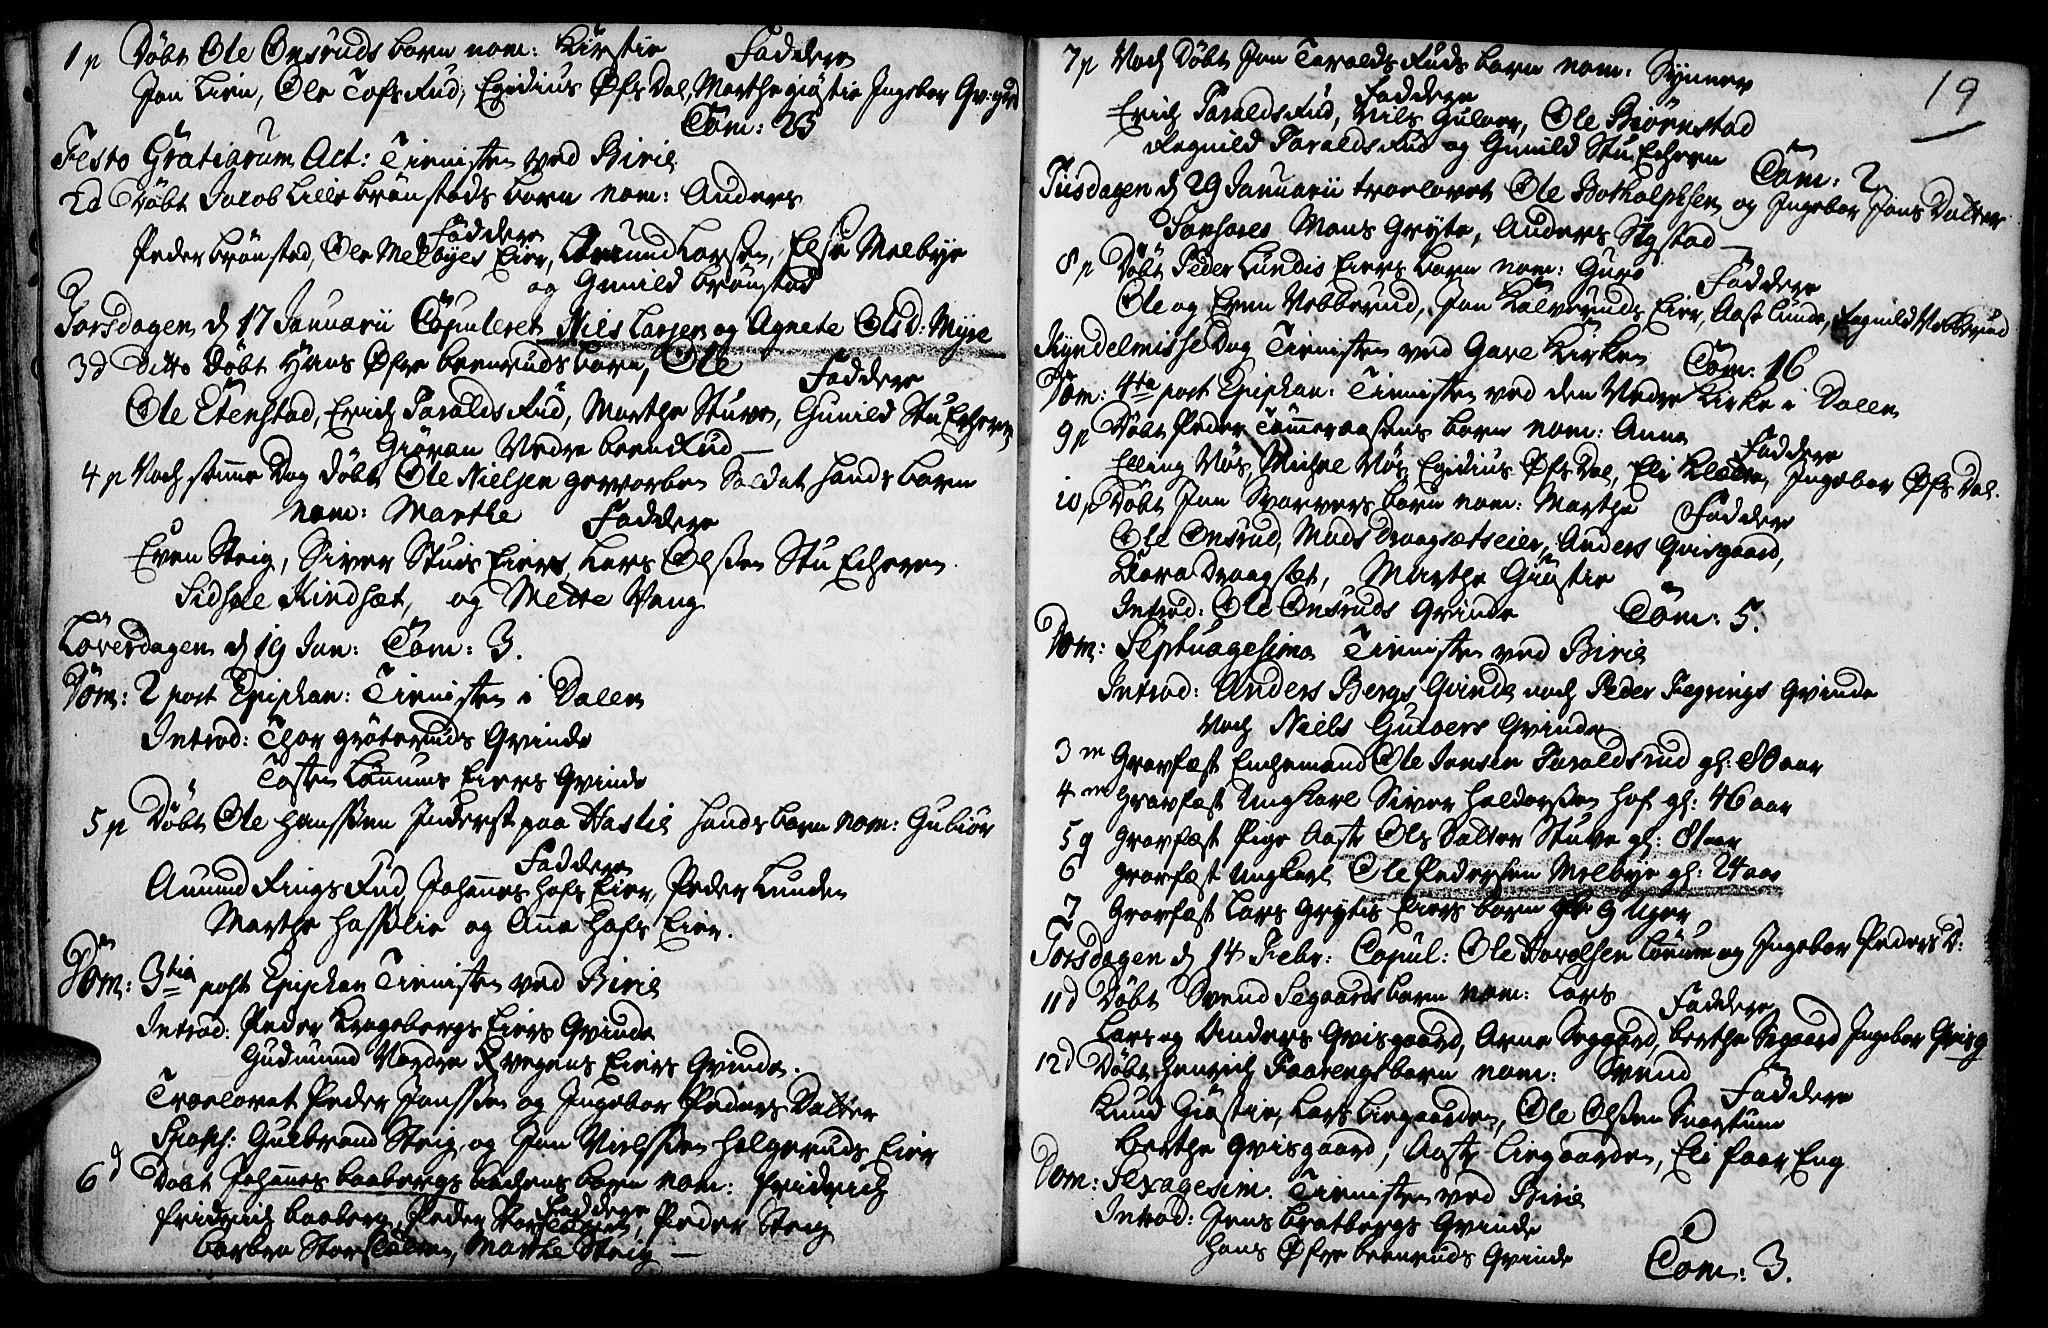 SAH, Biri prestekontor, Ministerialbok nr. 1, 1730-1754, s. 19